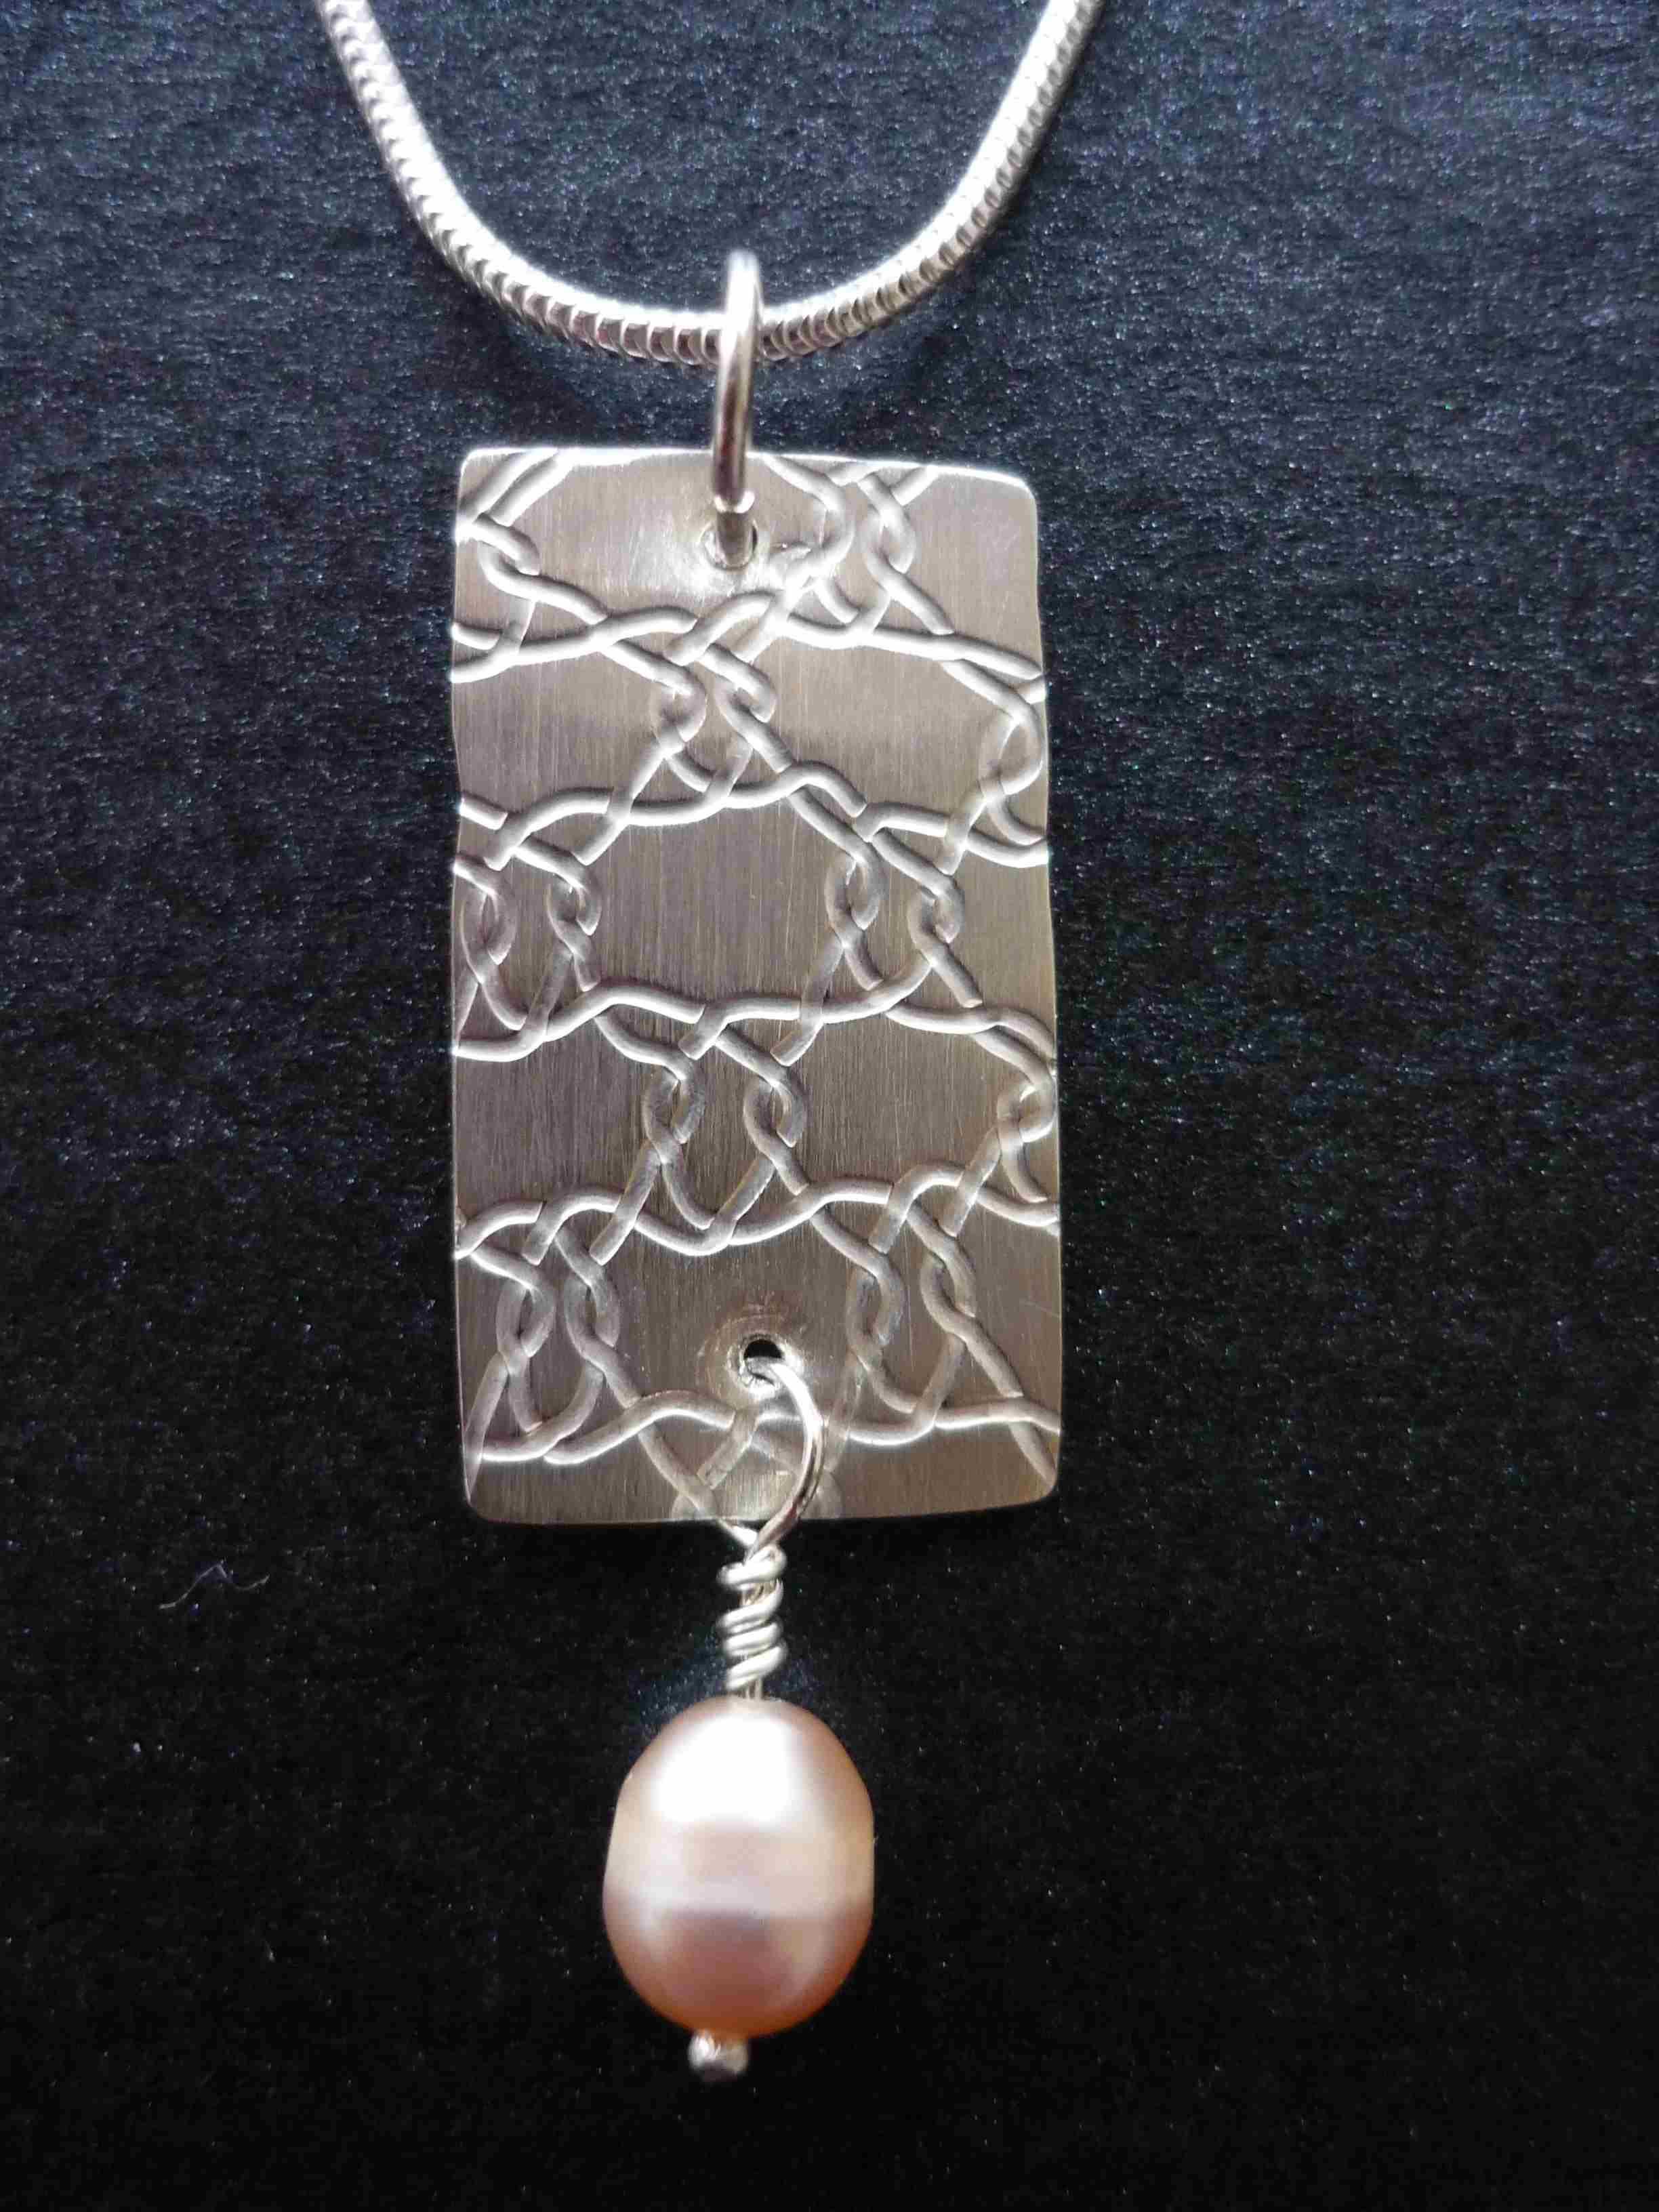 Rollprinted silver pendant